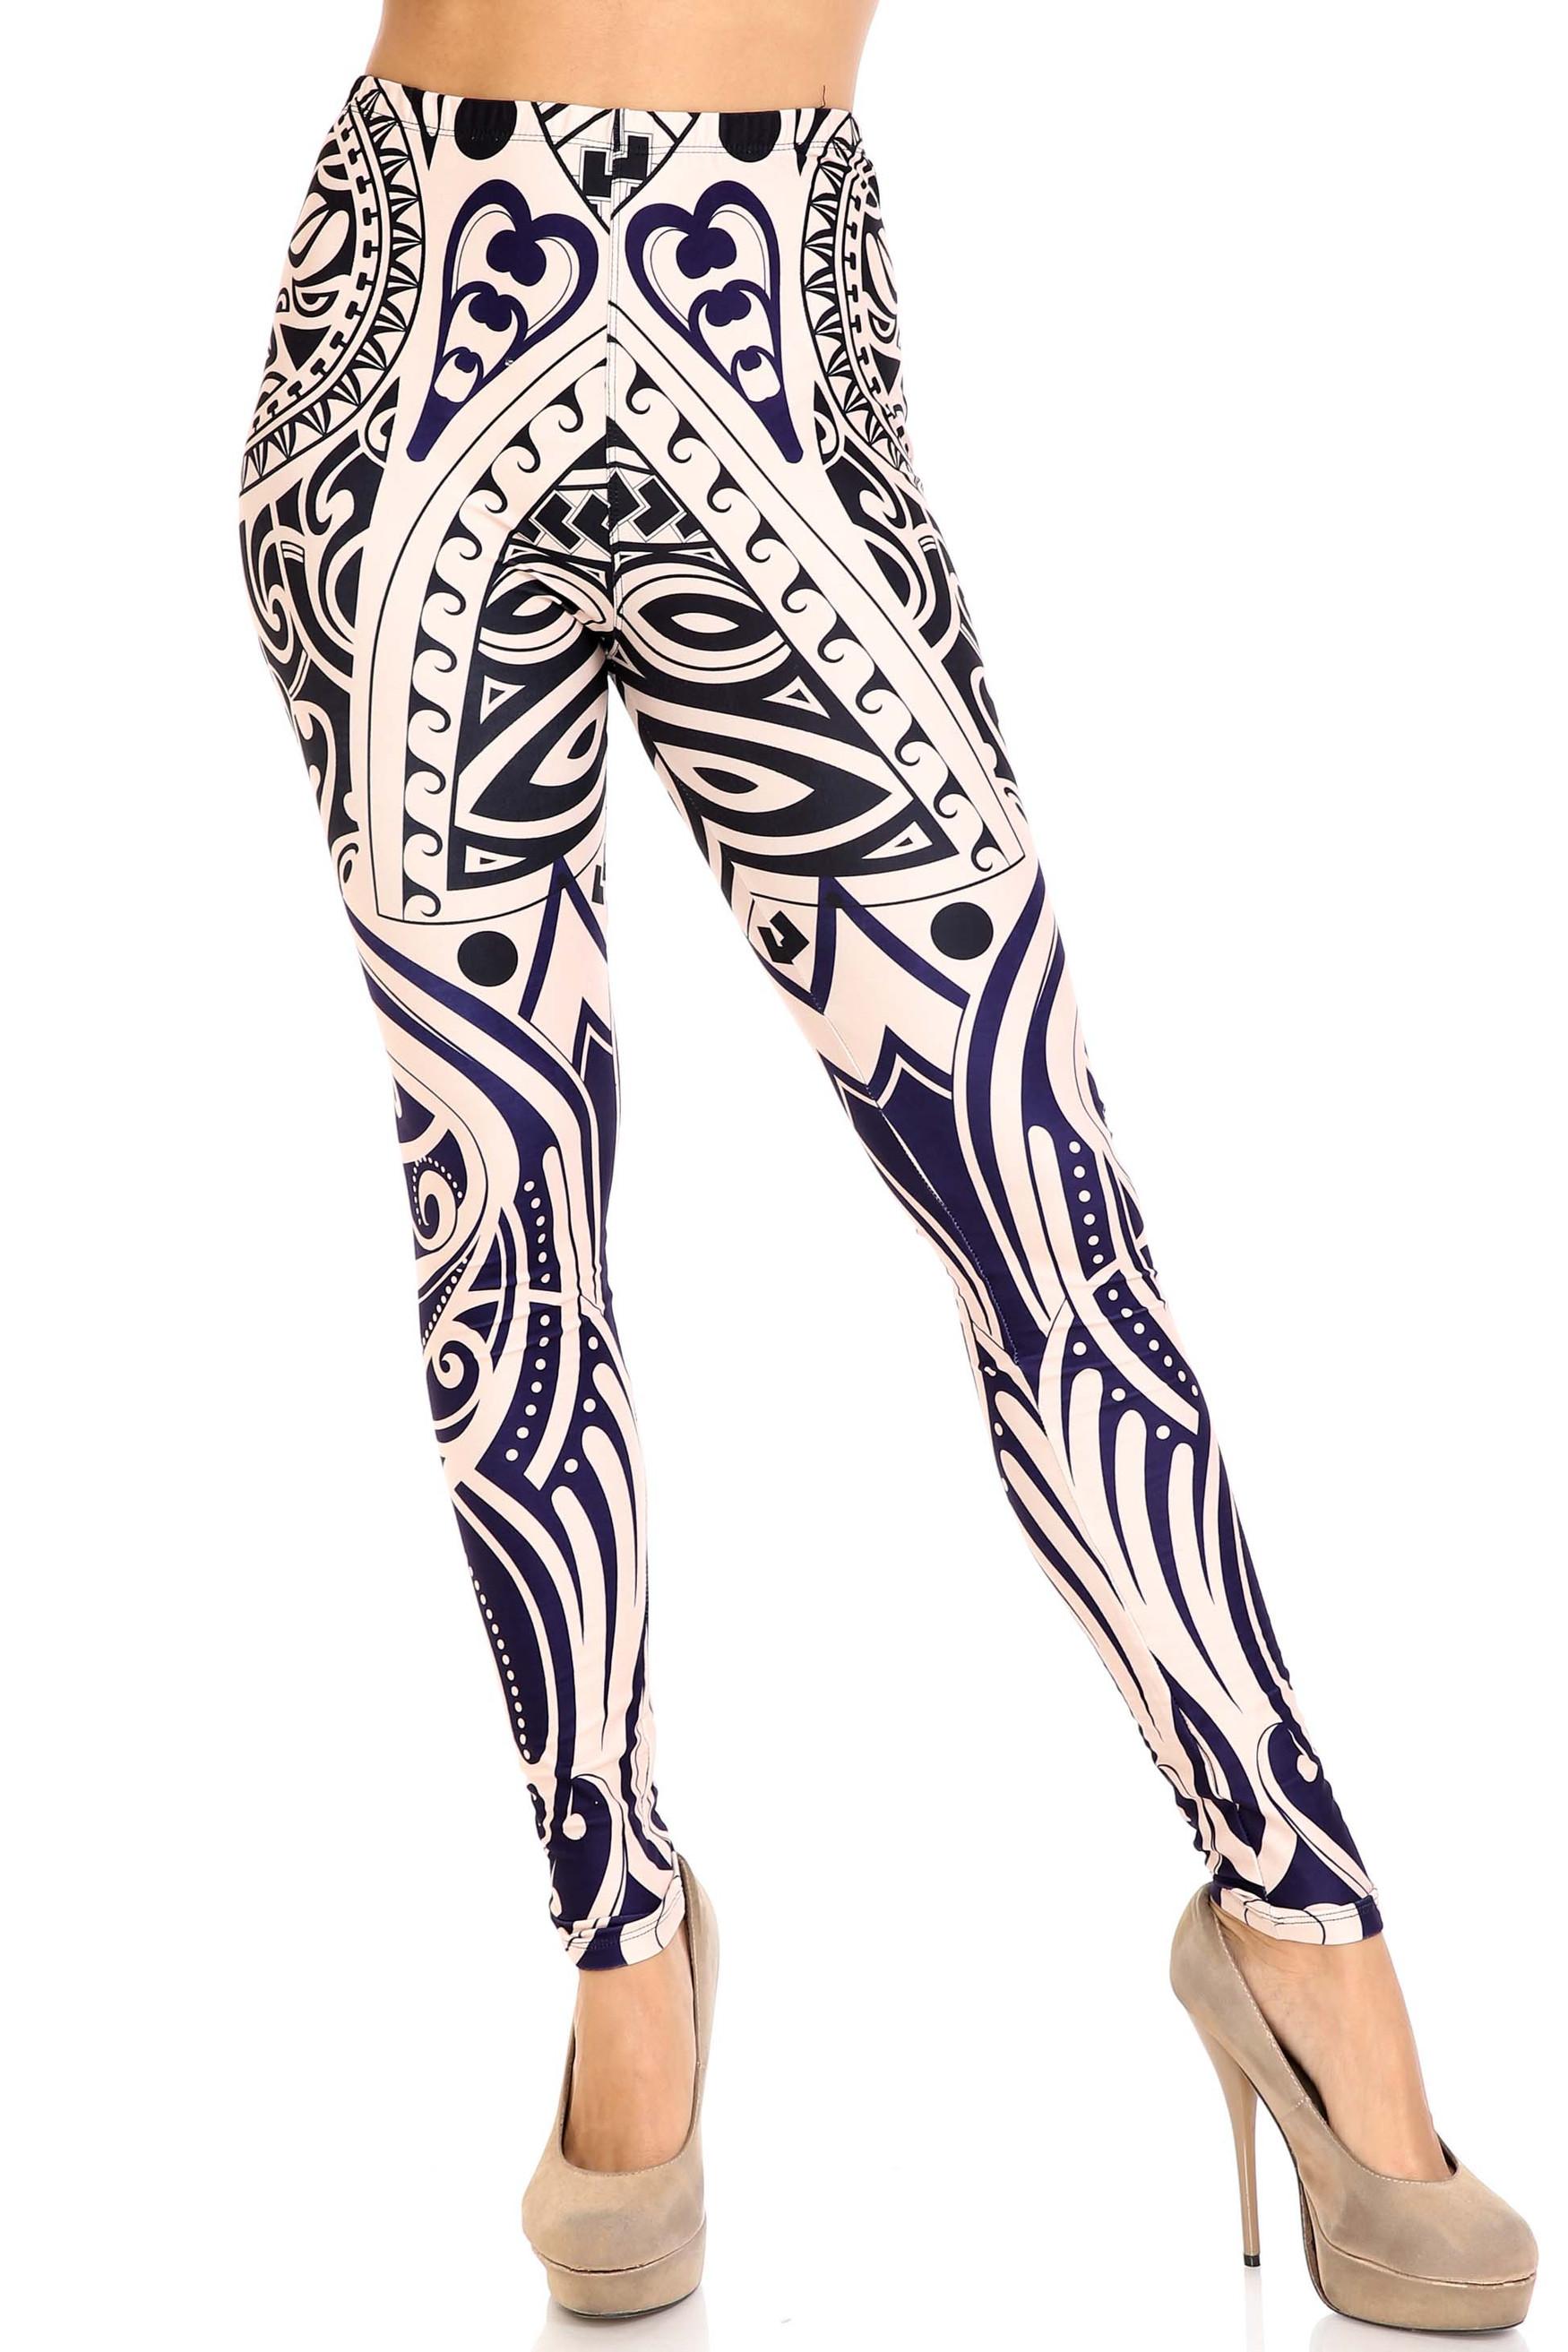 Front side image of Creamy Soft Valhalla Plus Size Leggings - USA Fashion™